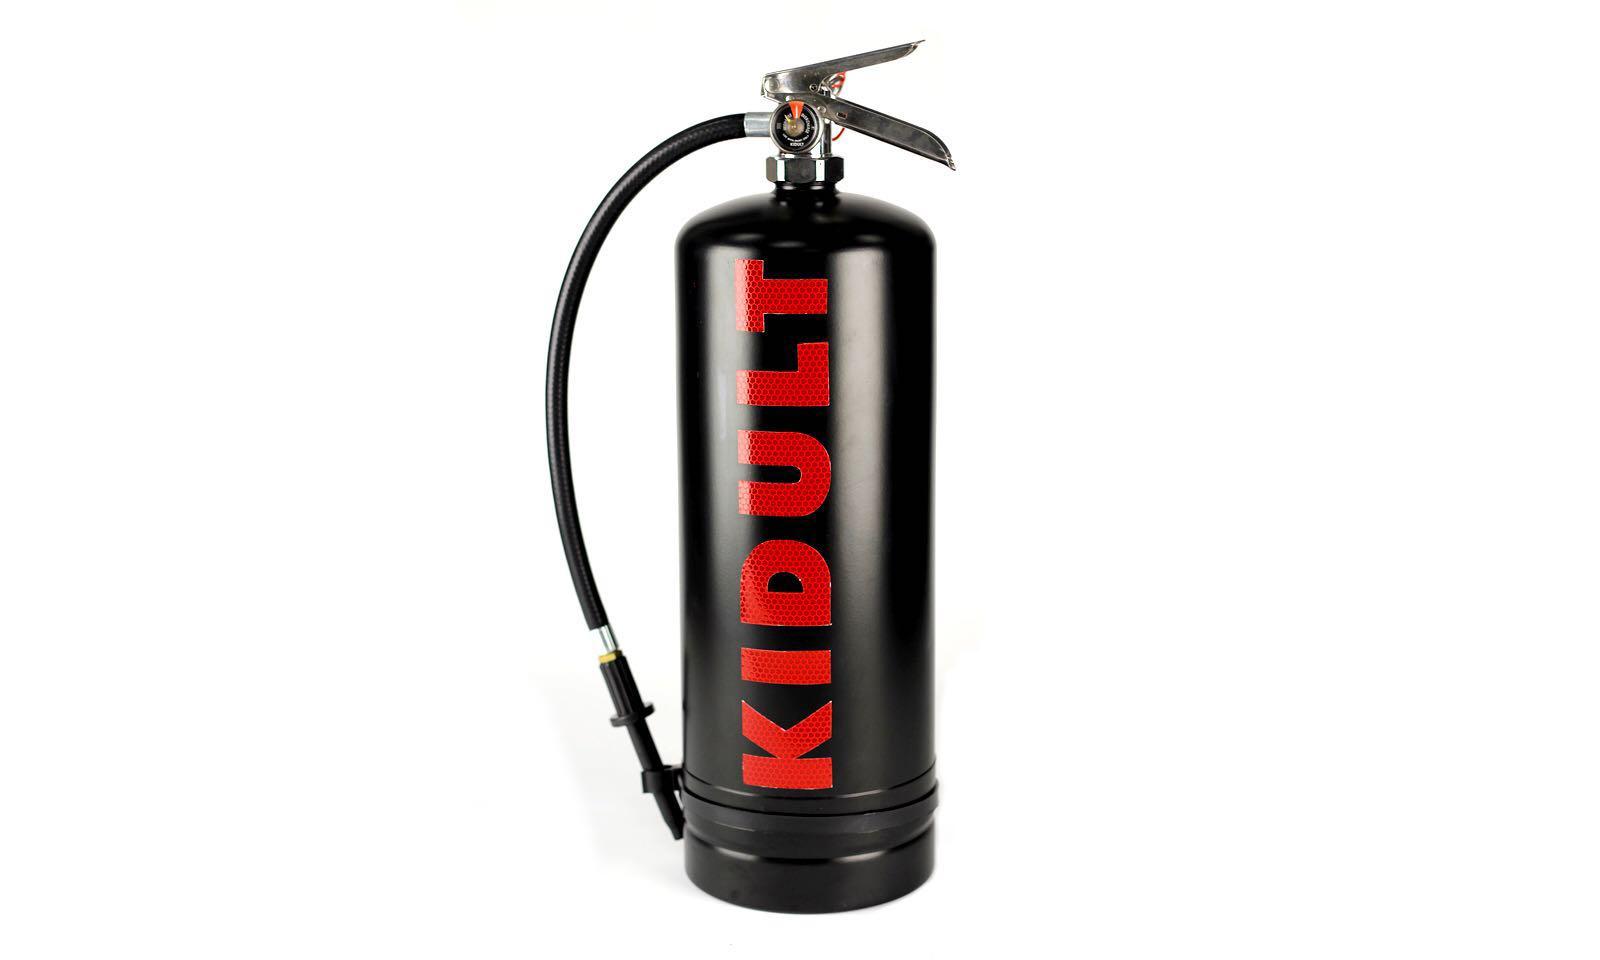 "Kidult 邀你一起 ""破坏时尚"",并免费送出 50 个特制喷漆桶"